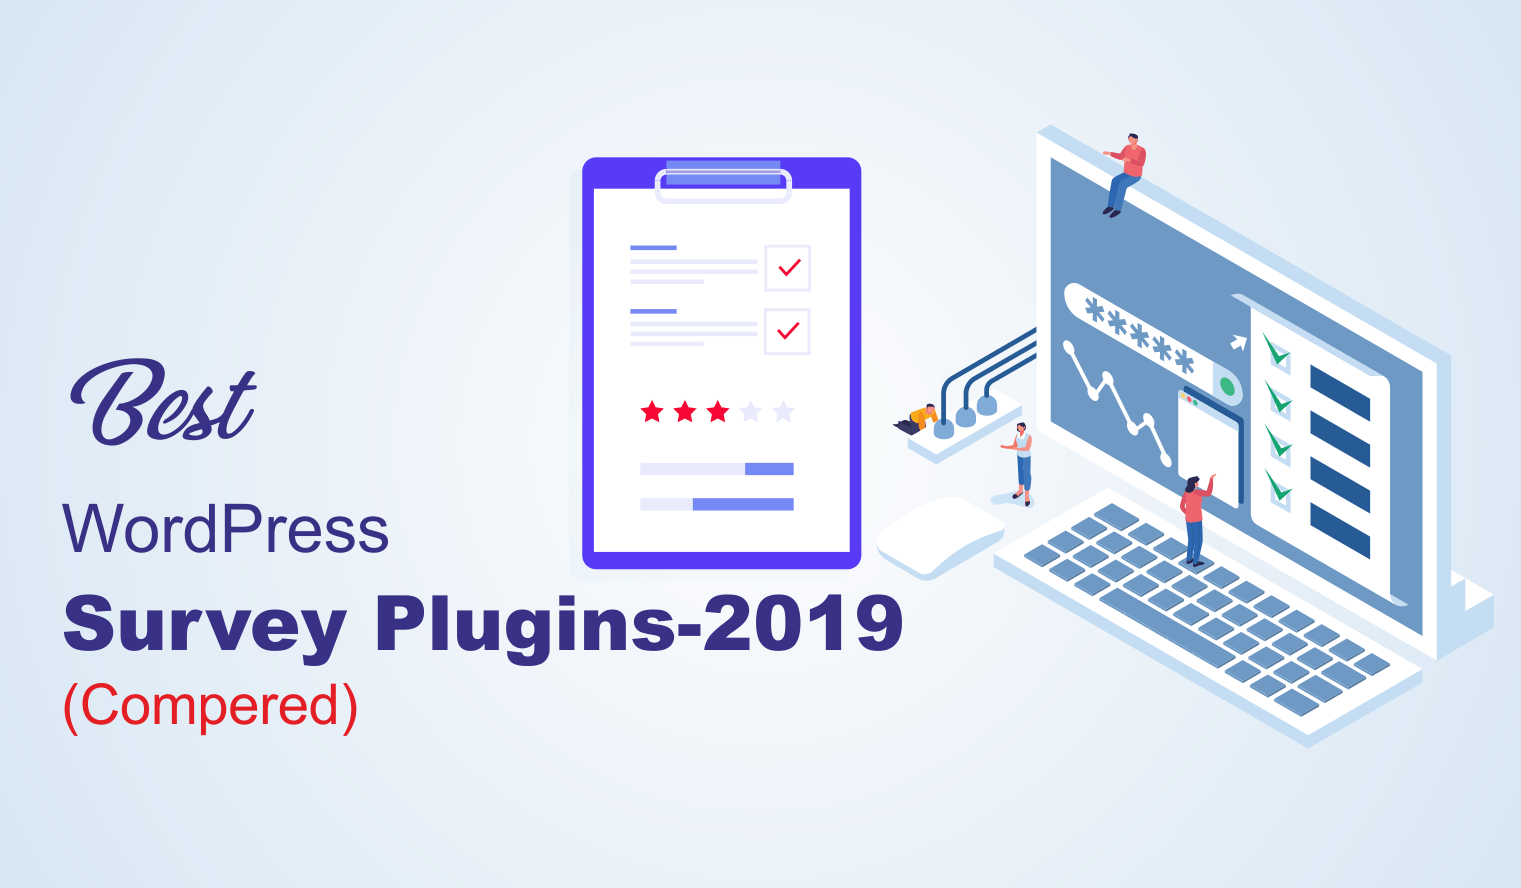 Best WordPress Survey Plugins-2019